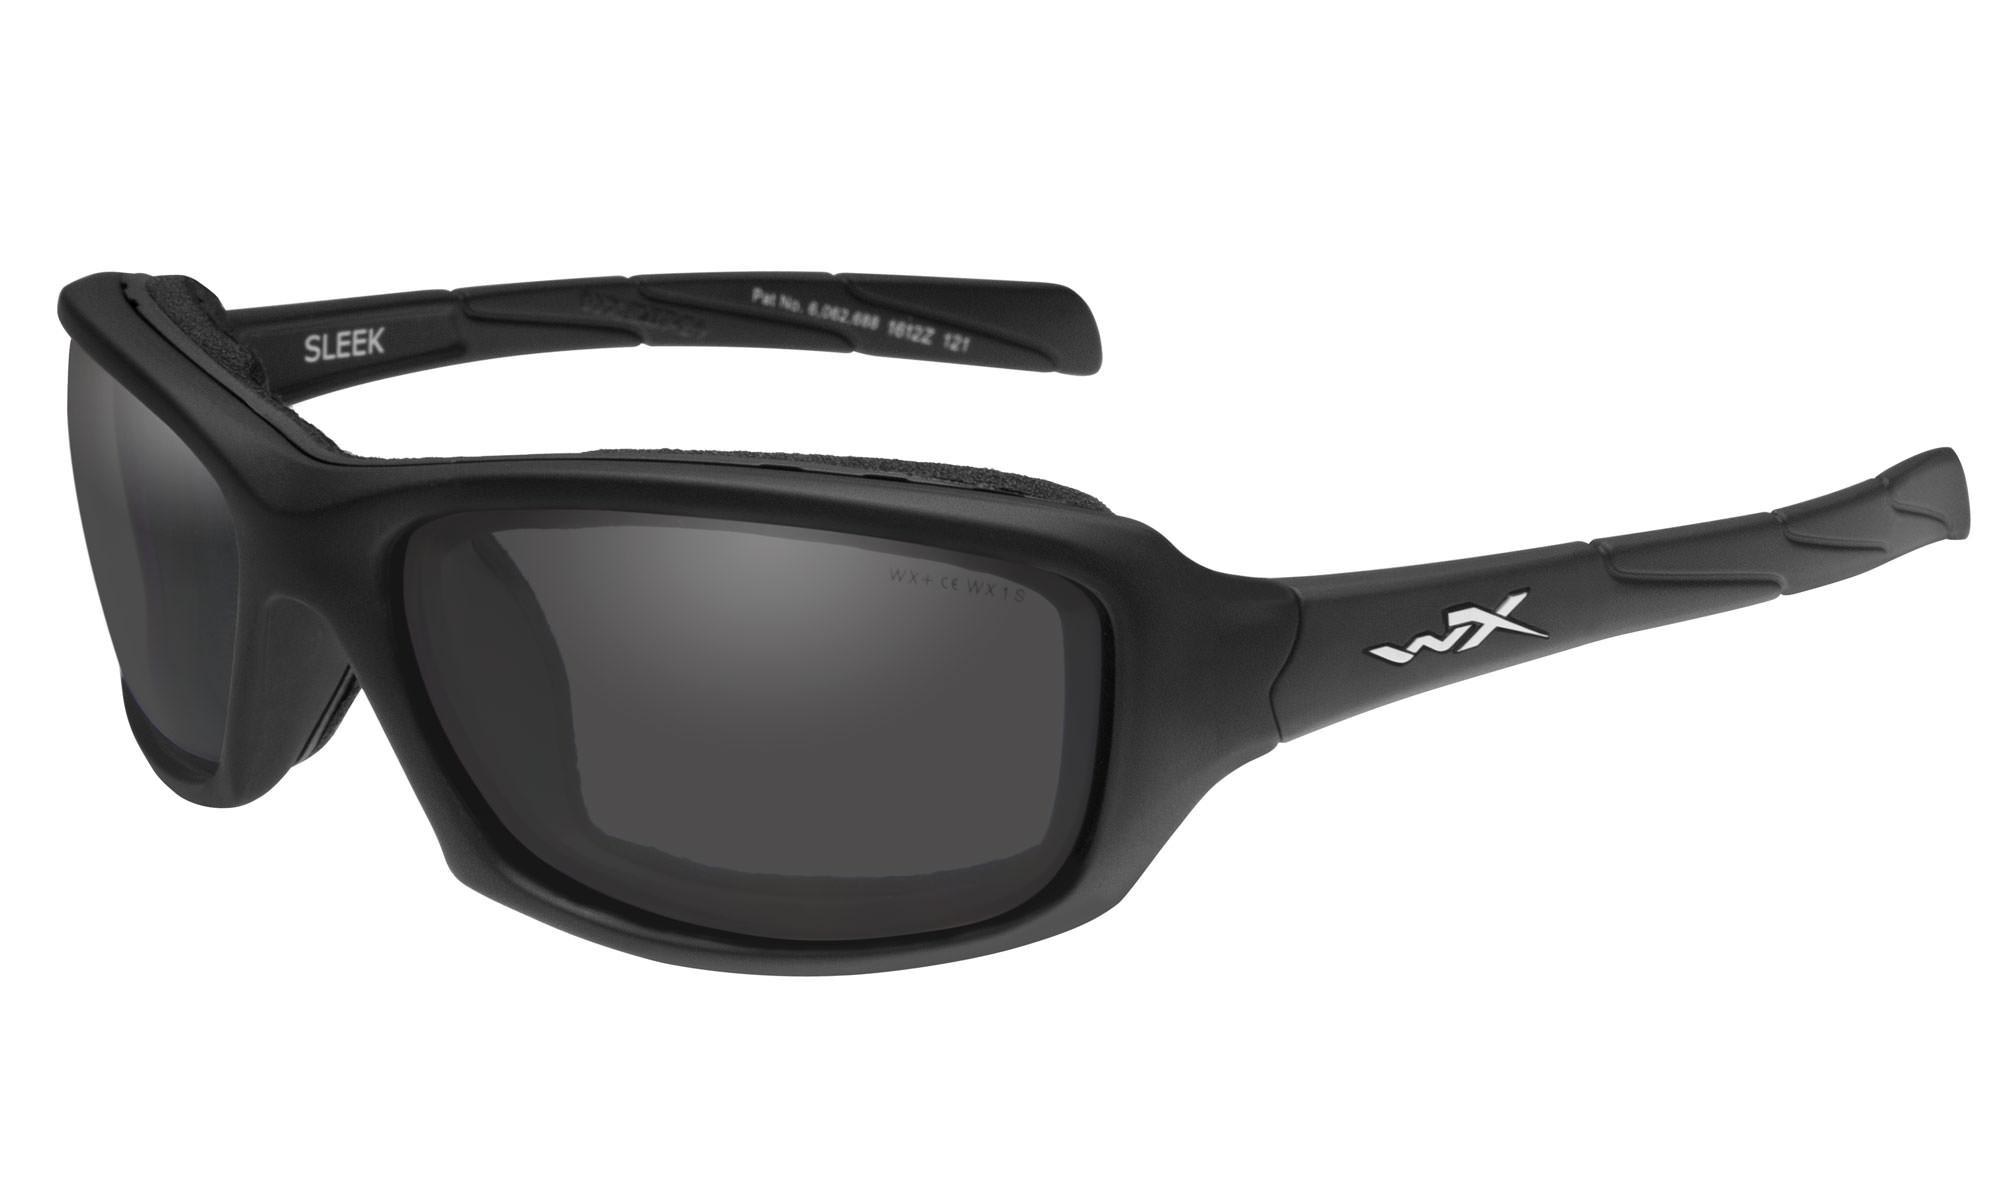 e2d3092e60 Wiley-X WX Sleek Matte Black with Smoke Grey Lenses